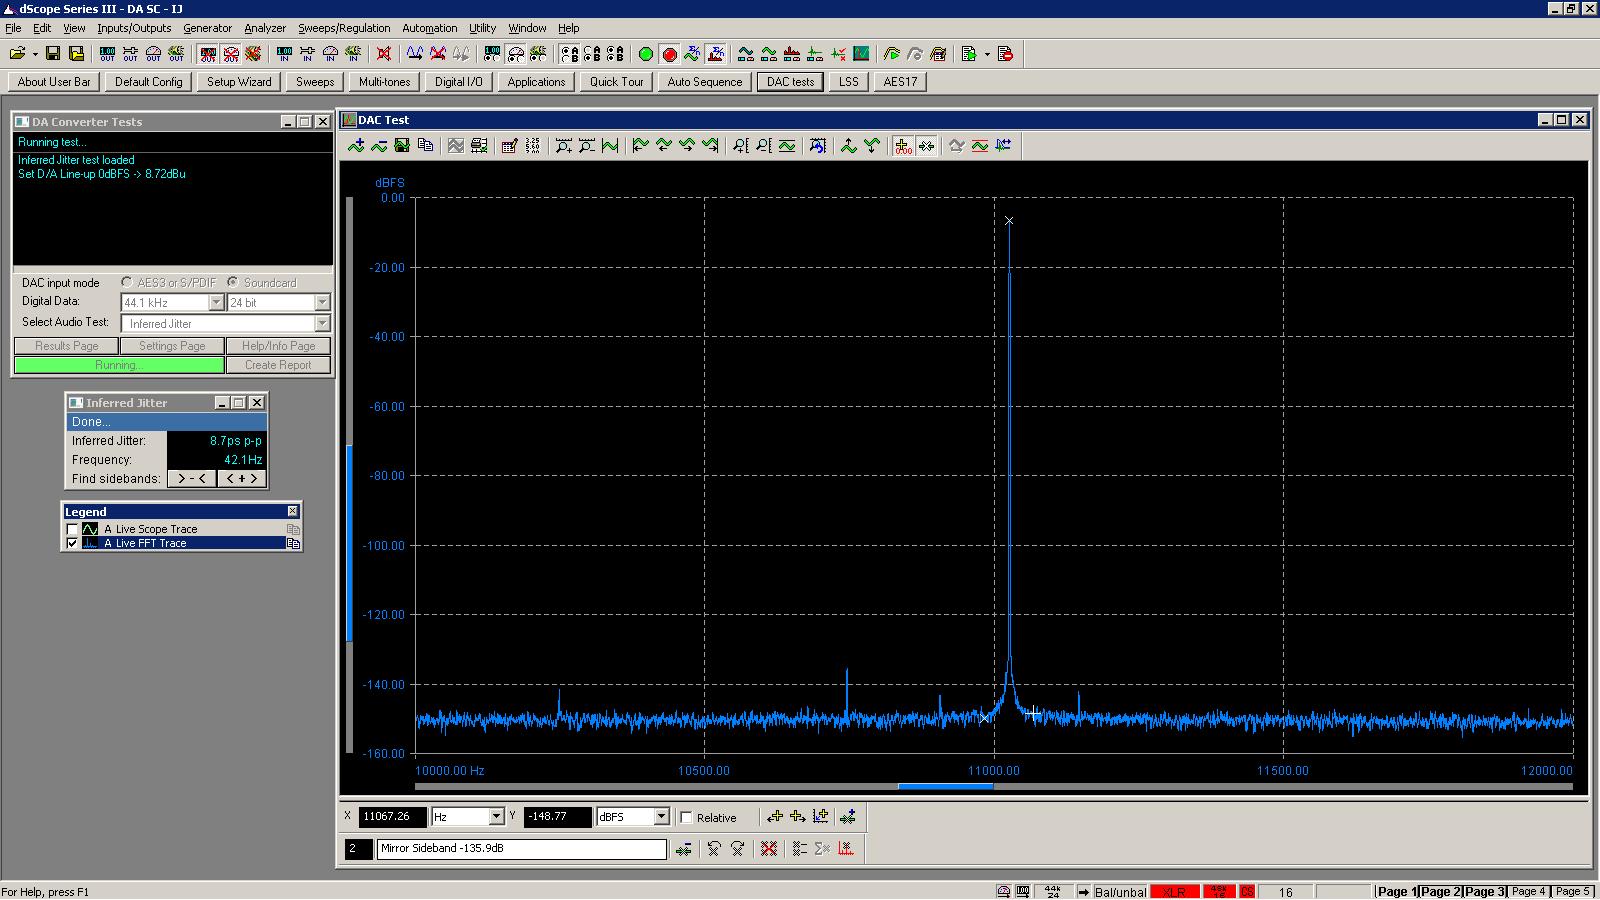 20151120 Bifrost MB SE inferred jitter - 2KHz BW - USB.PNG